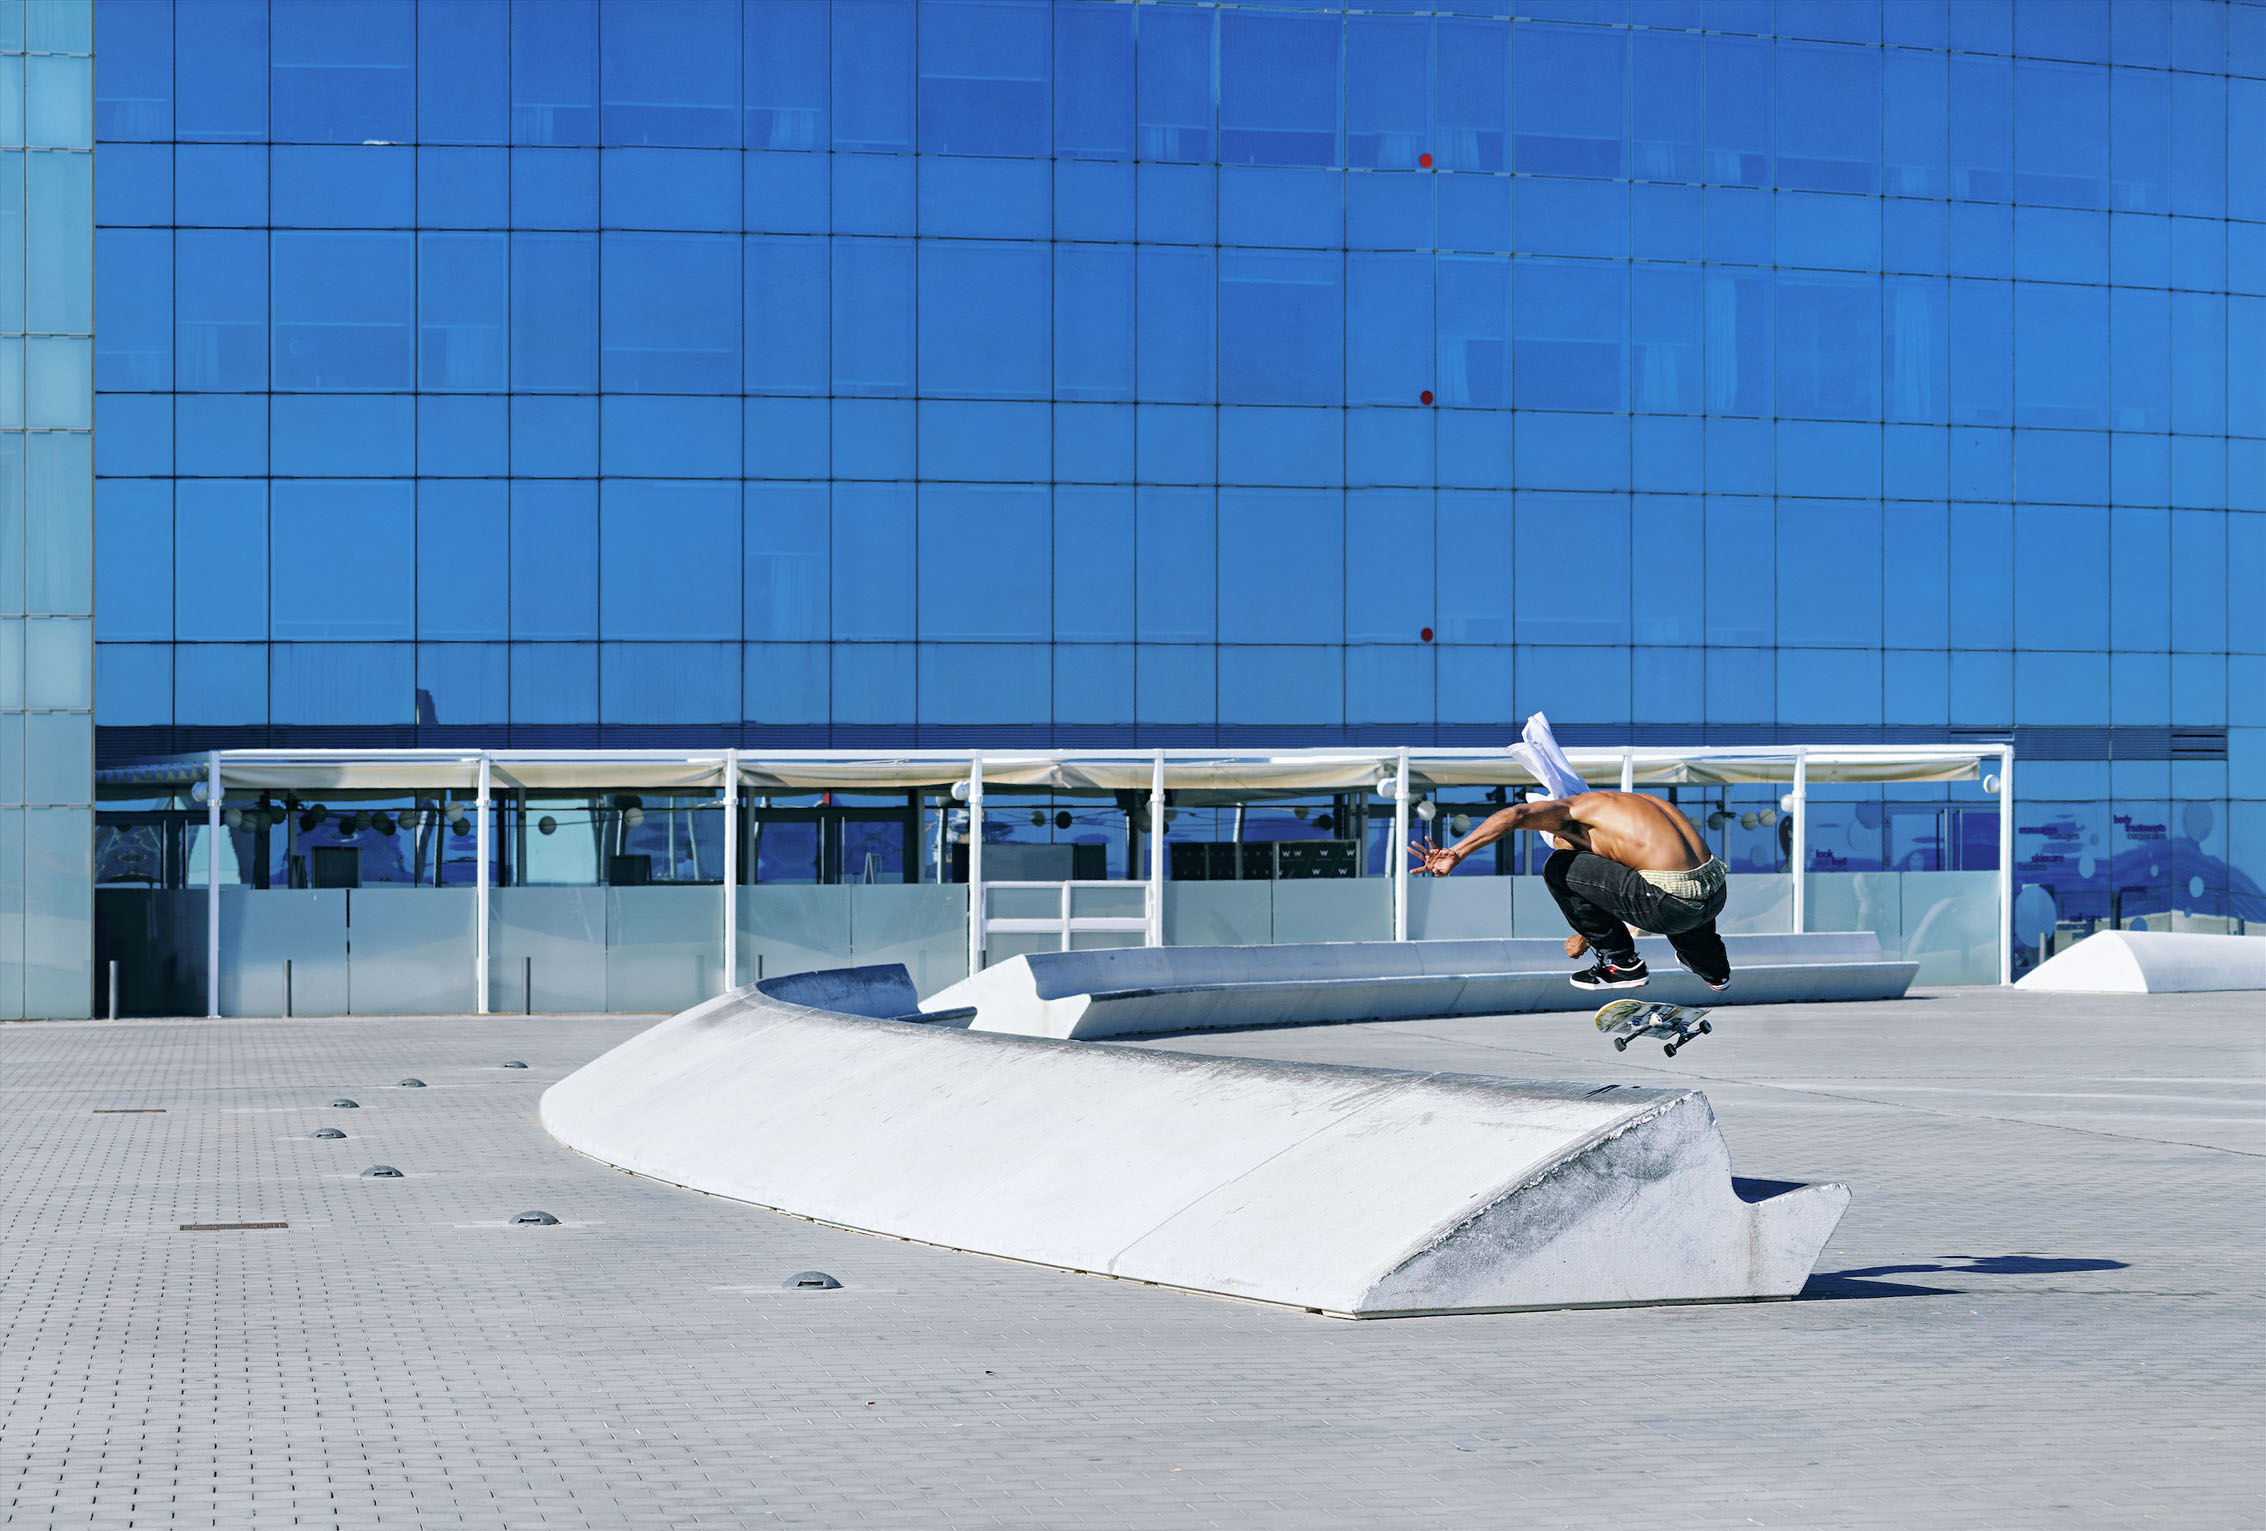 THIAGO LEMOS bs flip over the W curb_BE Skate Mag_Skate Pic.jpg